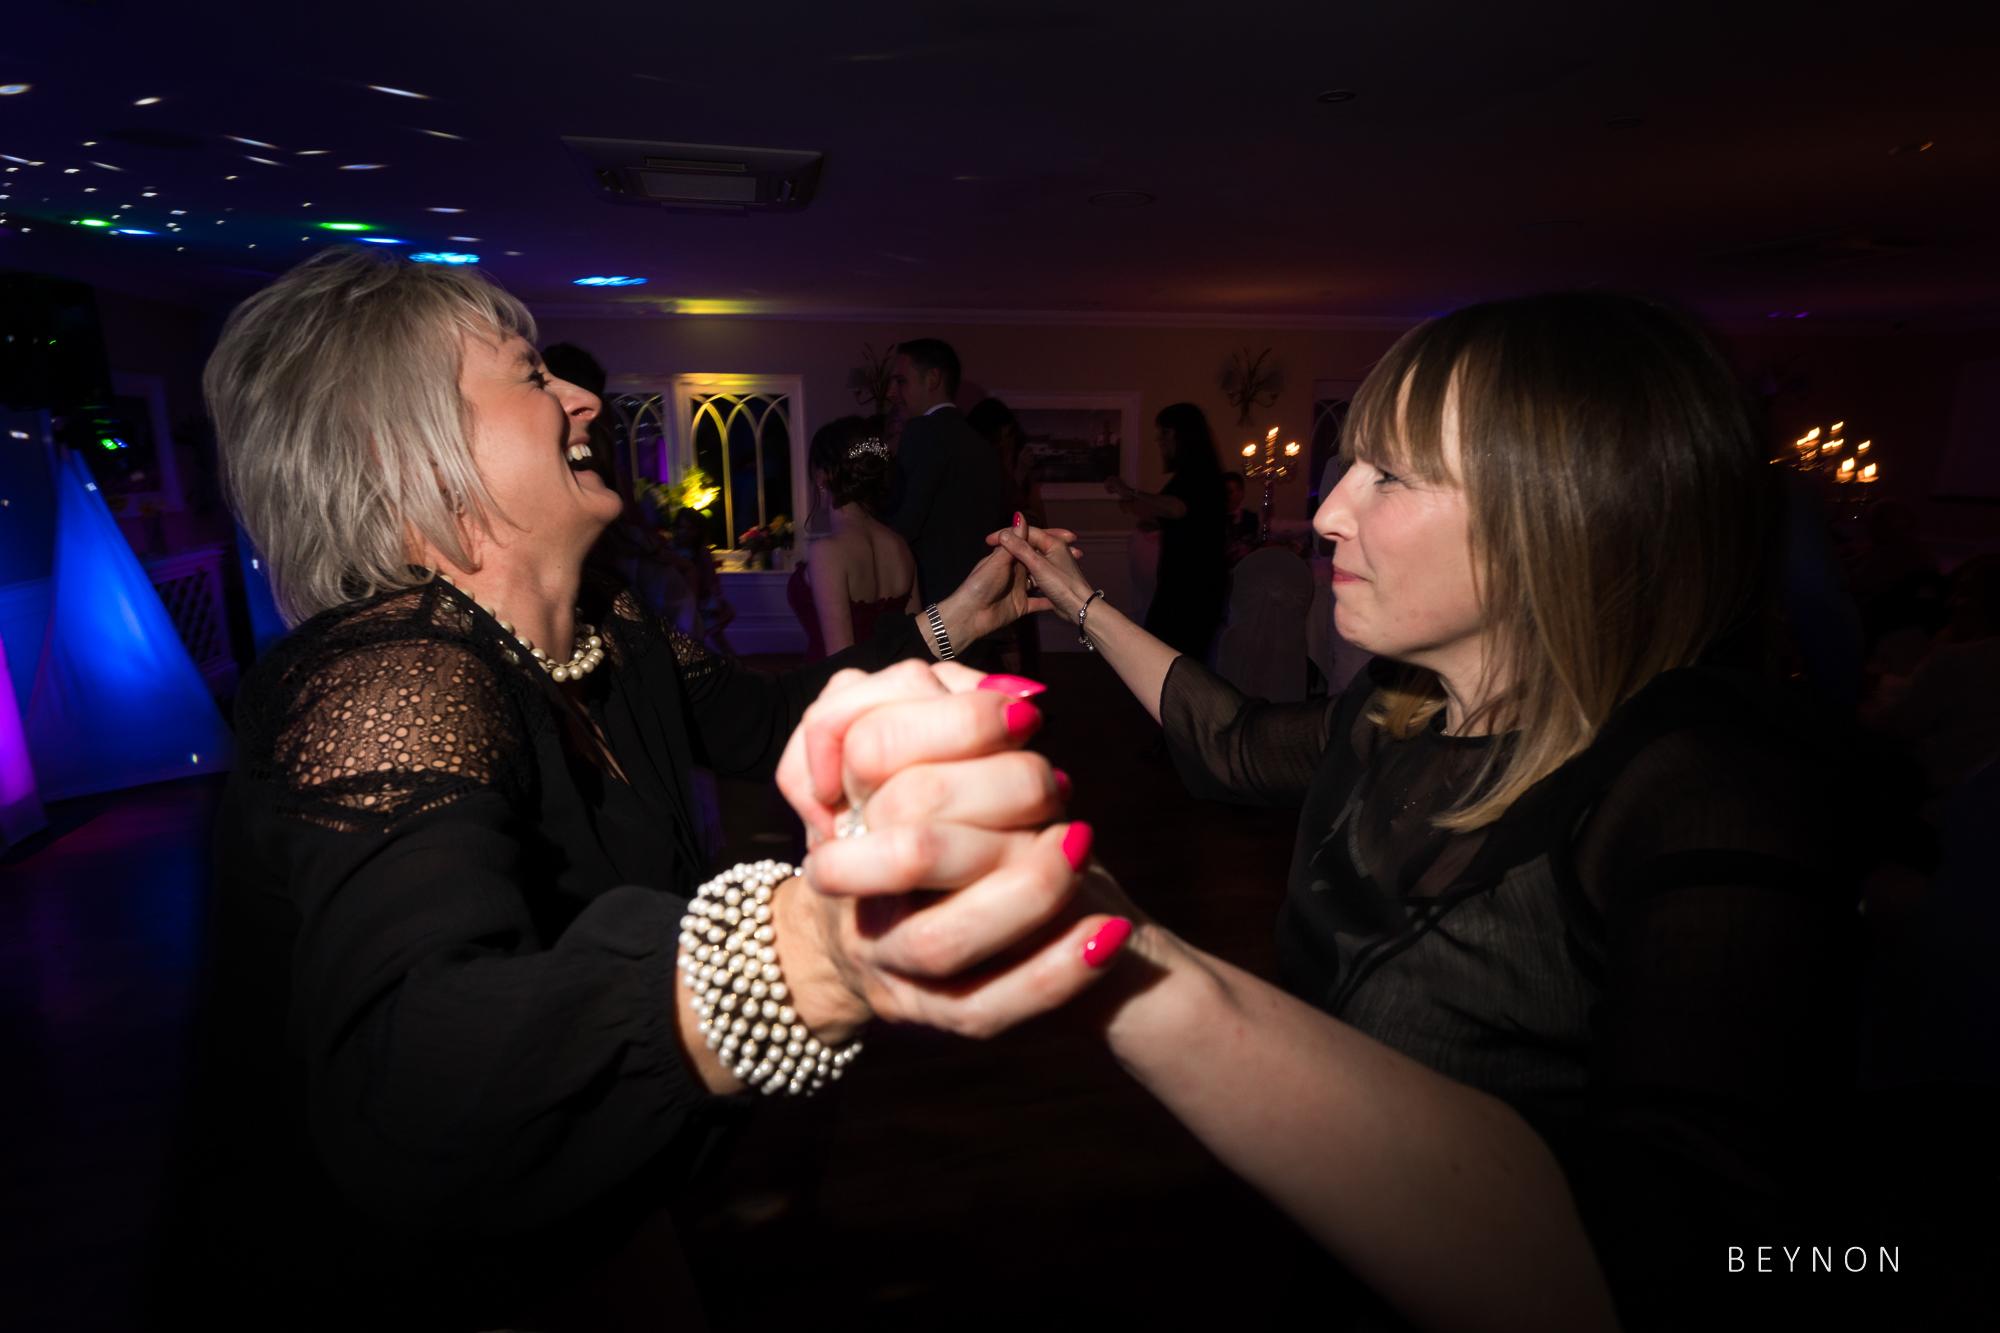 Guests dance hand in hand